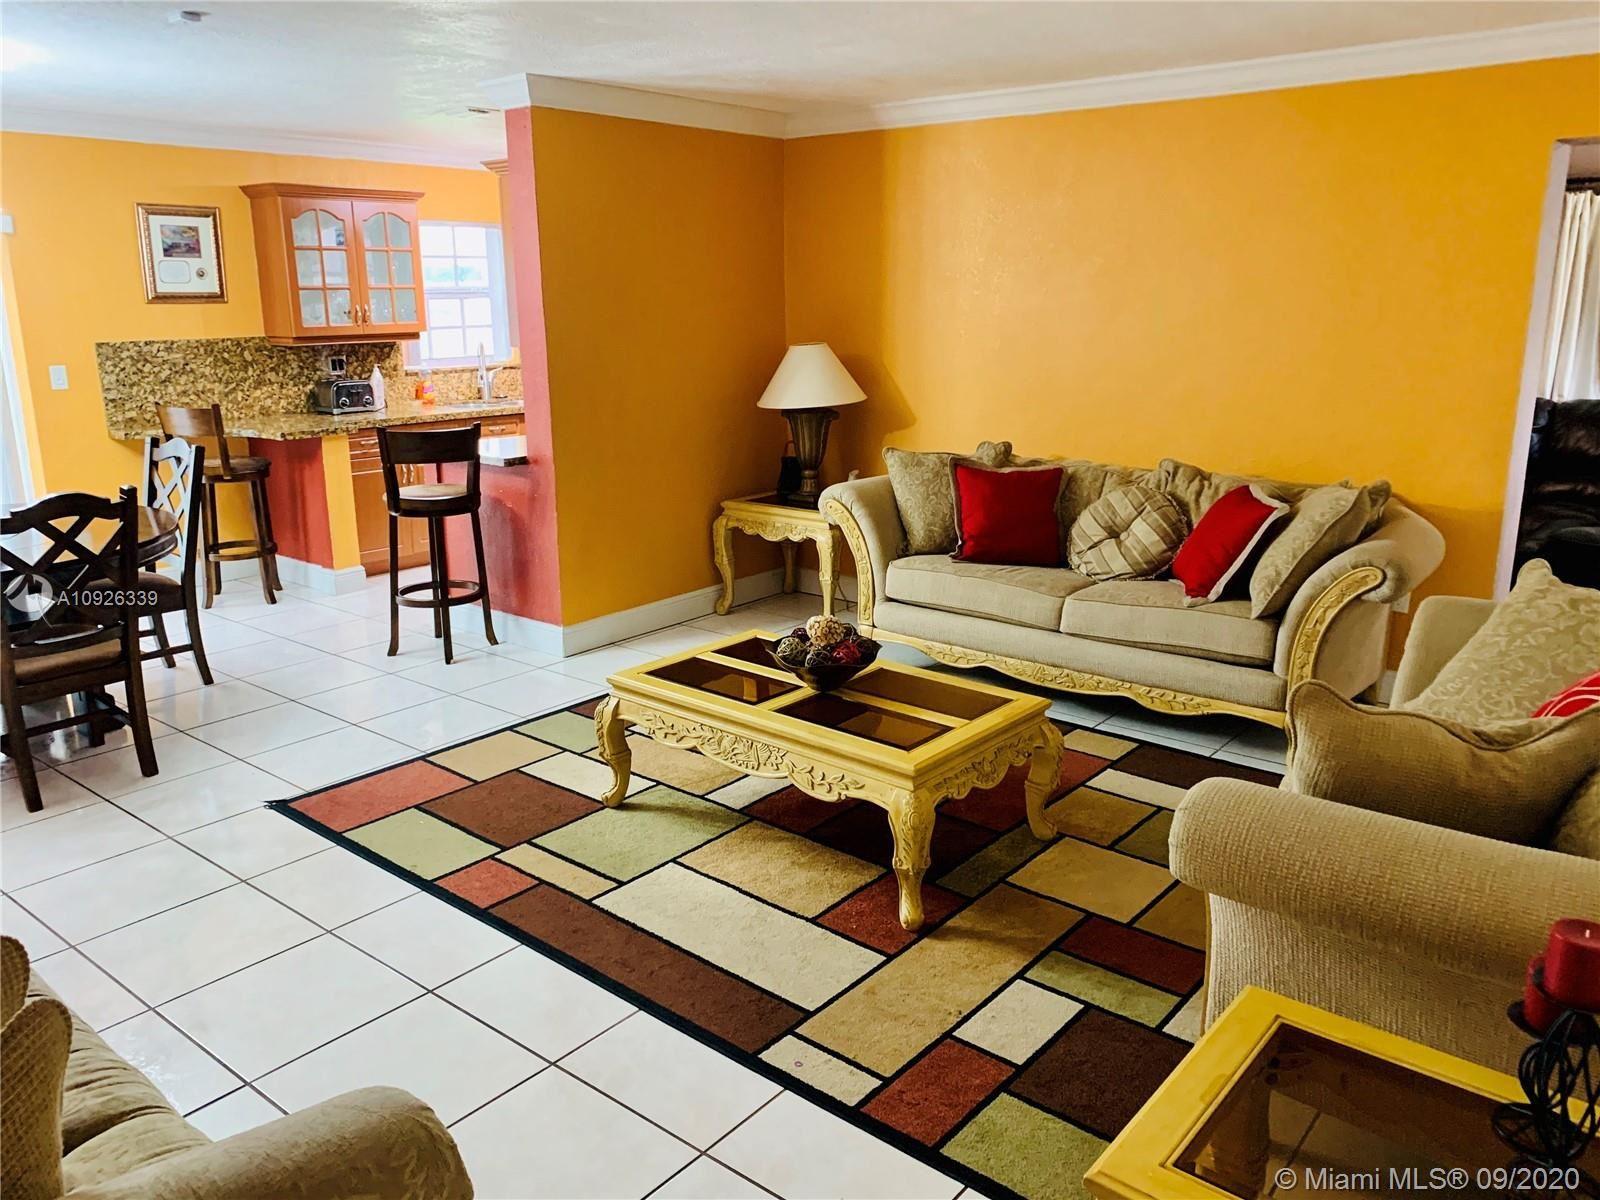 Photo of 7770 Indigo St, Miramar, FL 33023 (MLS # A10926339)